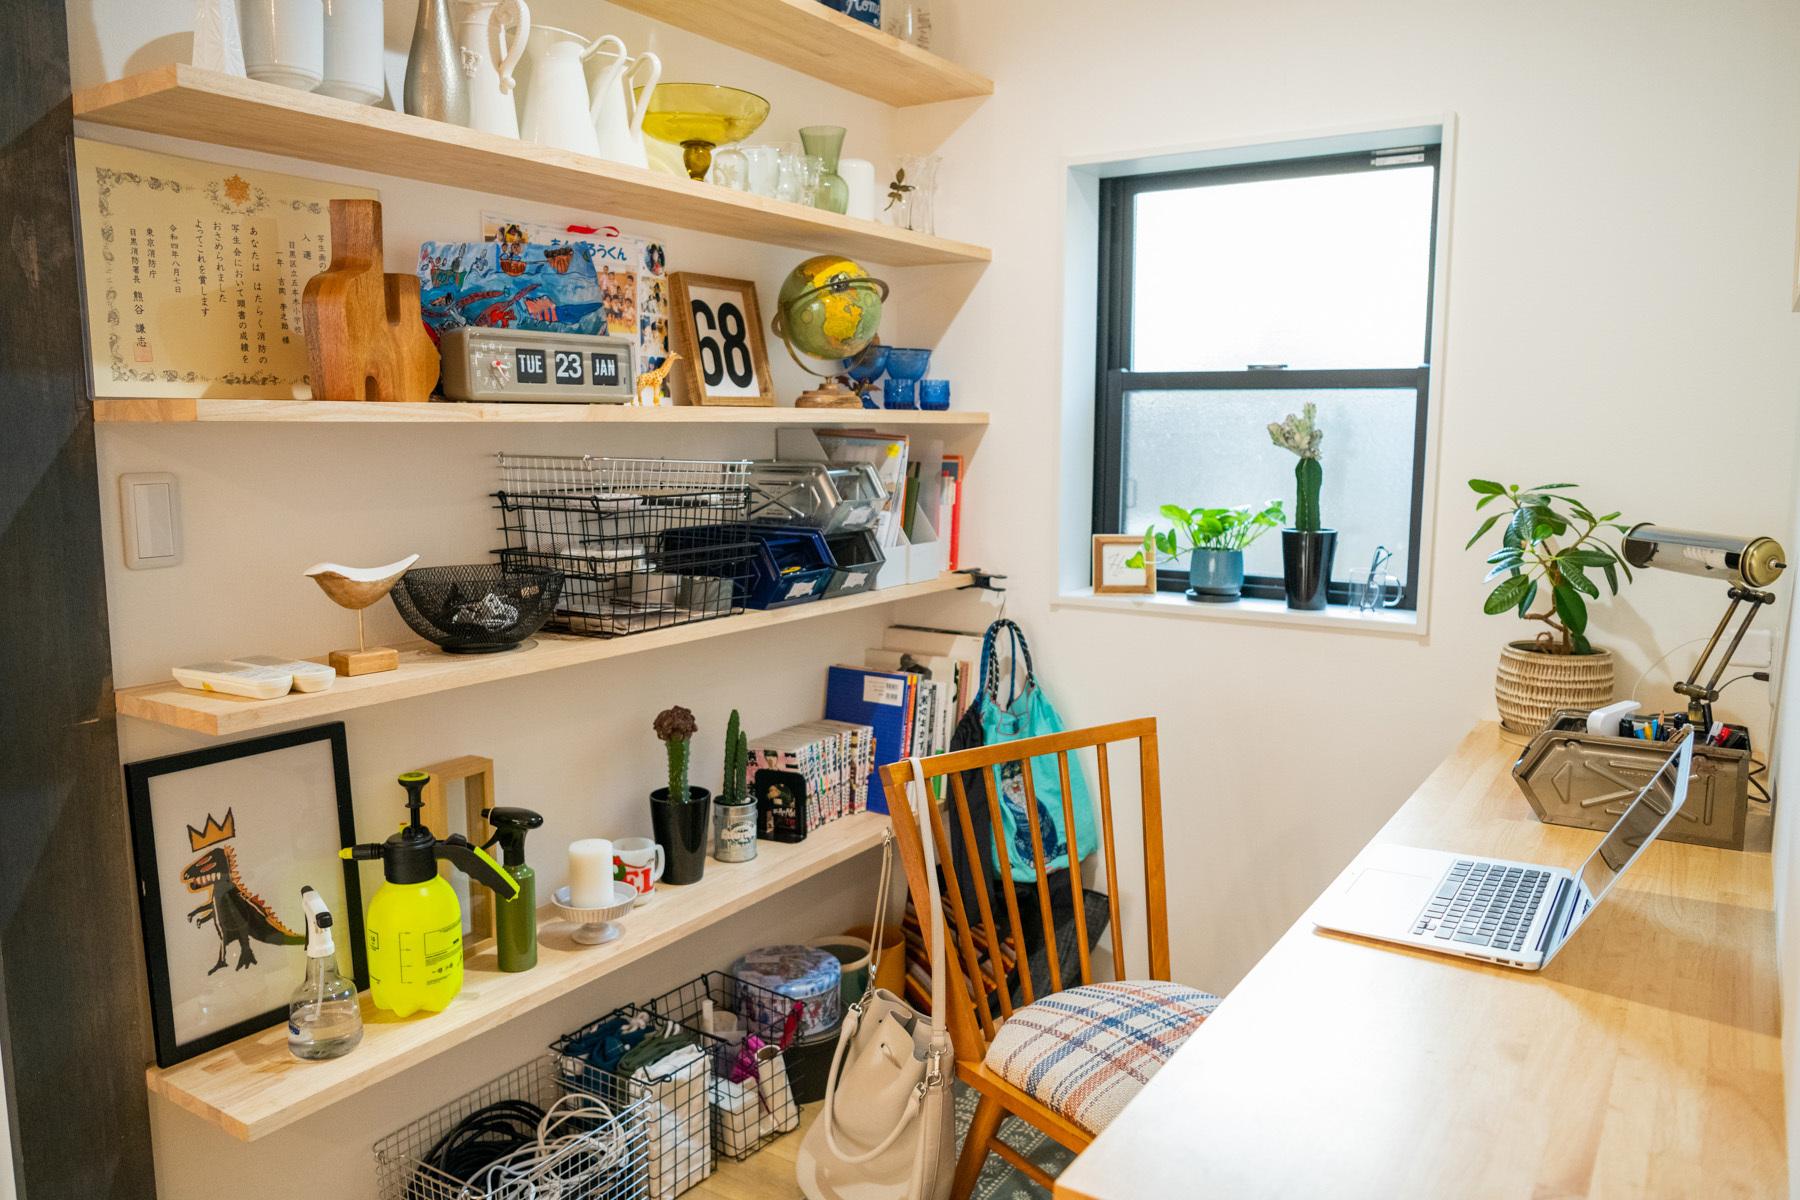 Home砧 (Studio Licorneマネージメントスペース)